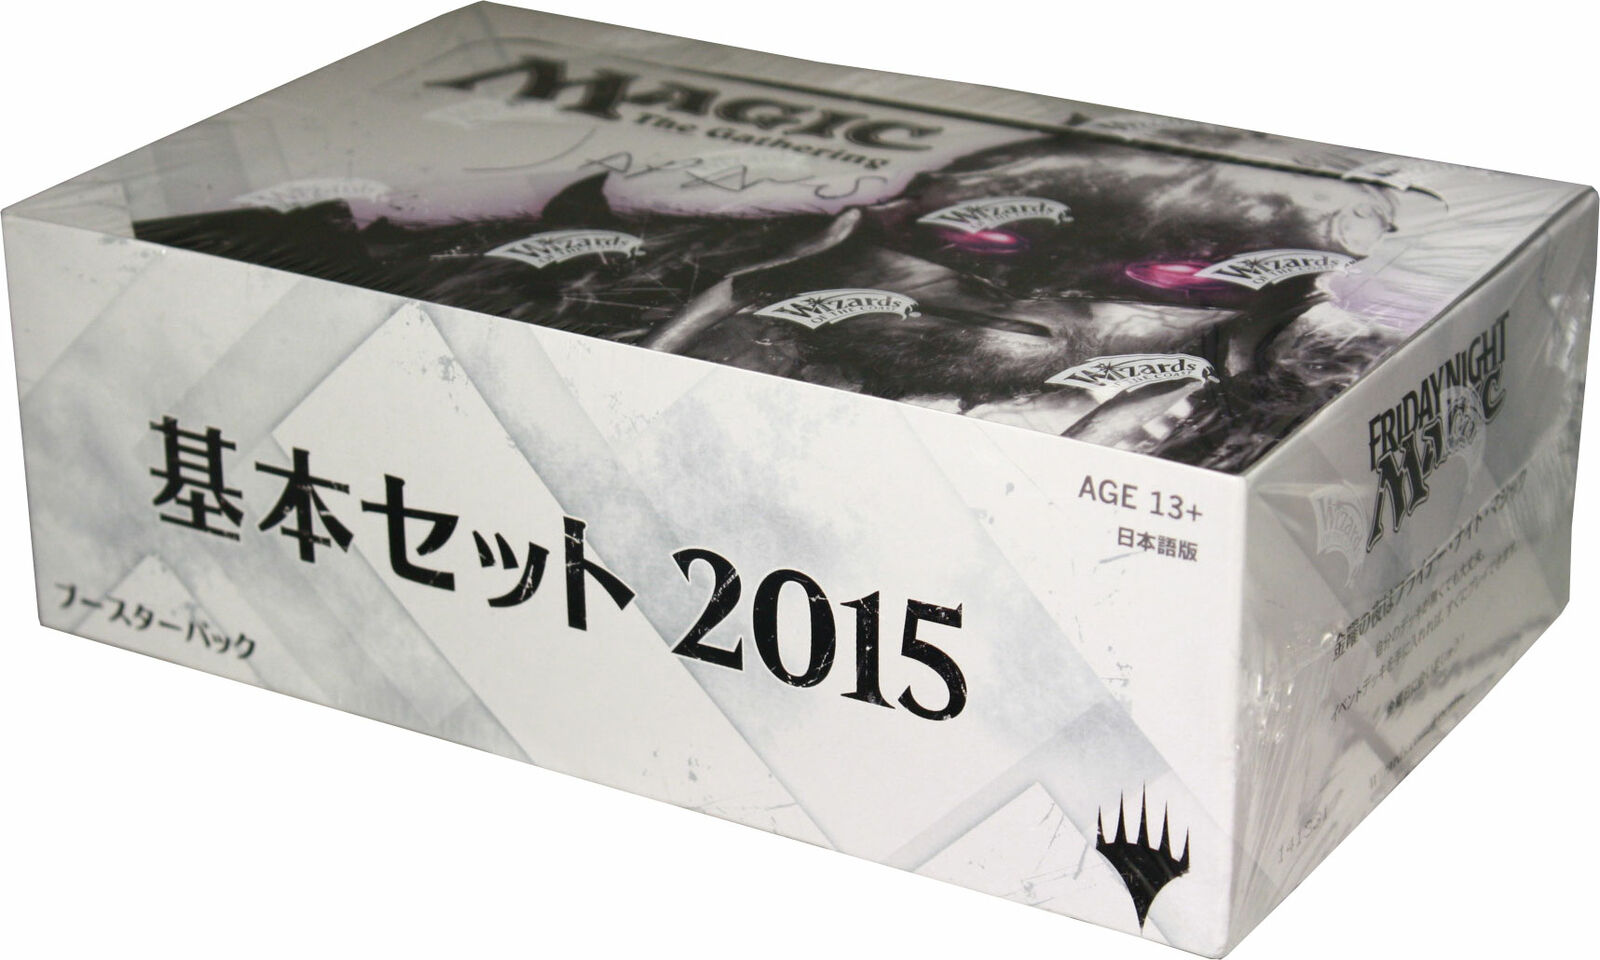 Magic The Gathering 2015 Core Set Japanese Japanese Japanese Booster Box d54b60